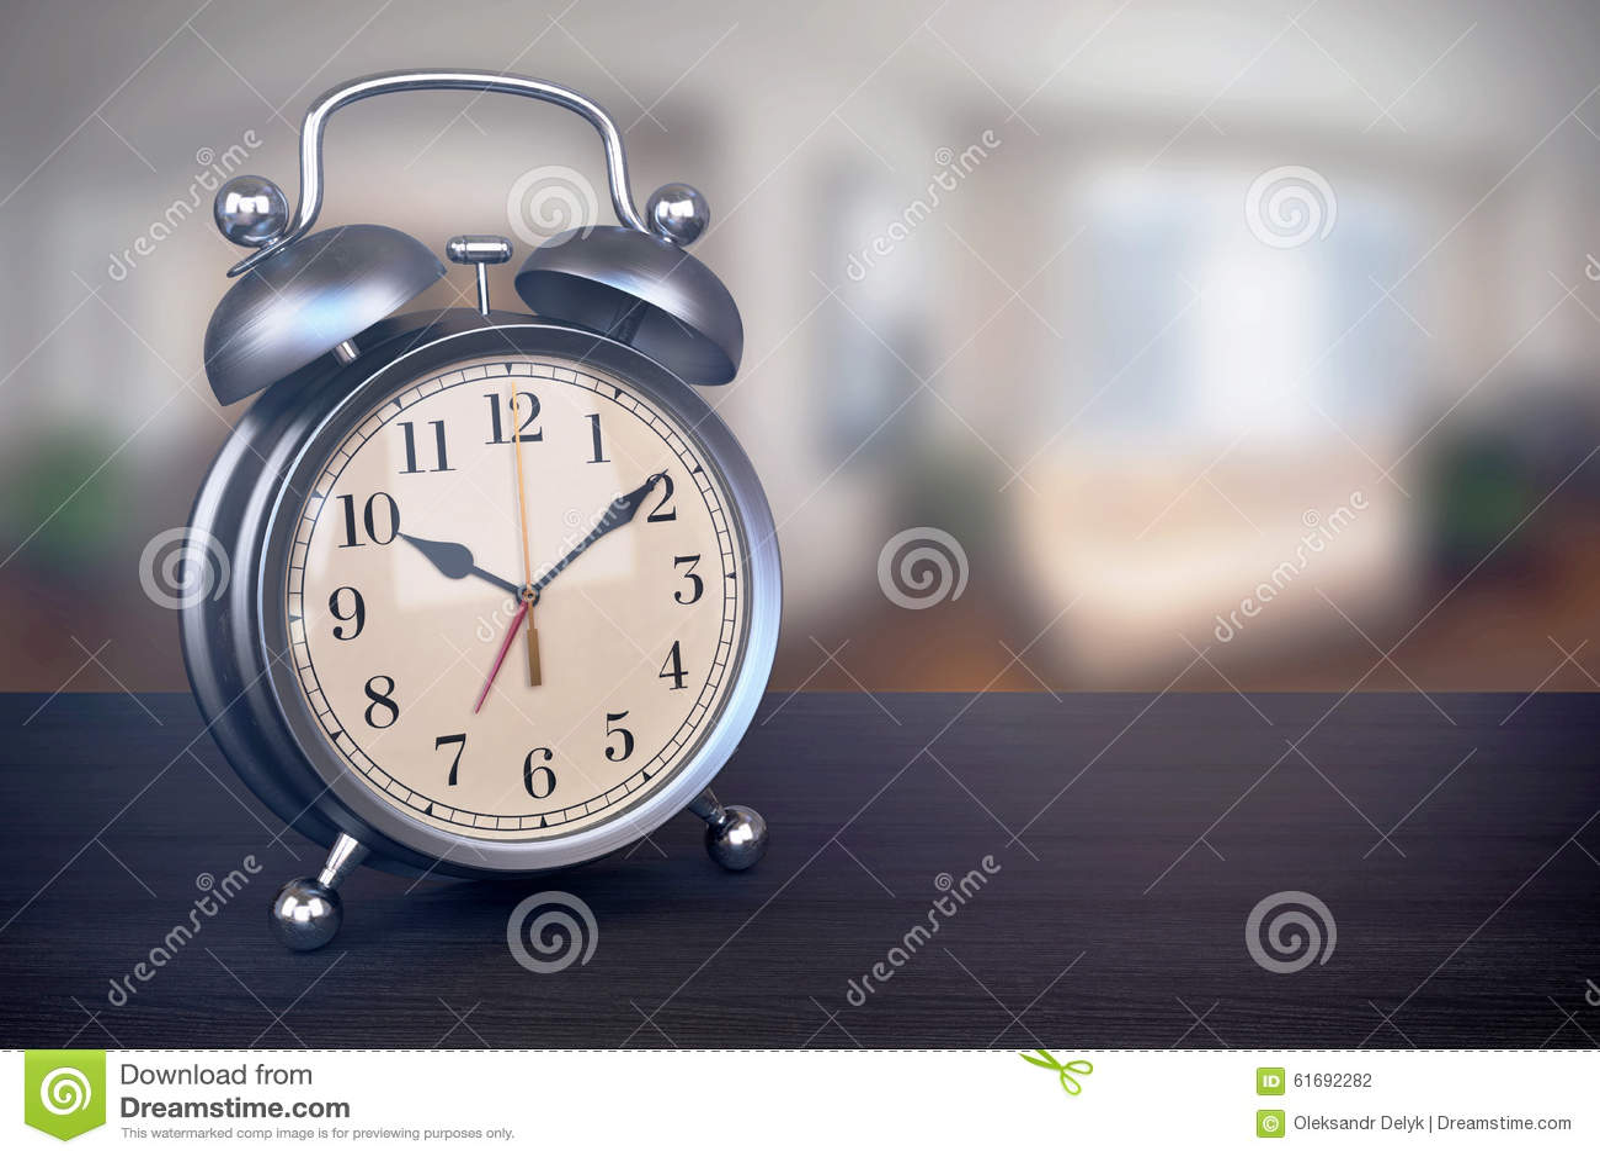 bedroom alarm clock. Royalty Free Illustration  Download Retro Alarm Clock On Bedside Table In Bedroom Stock